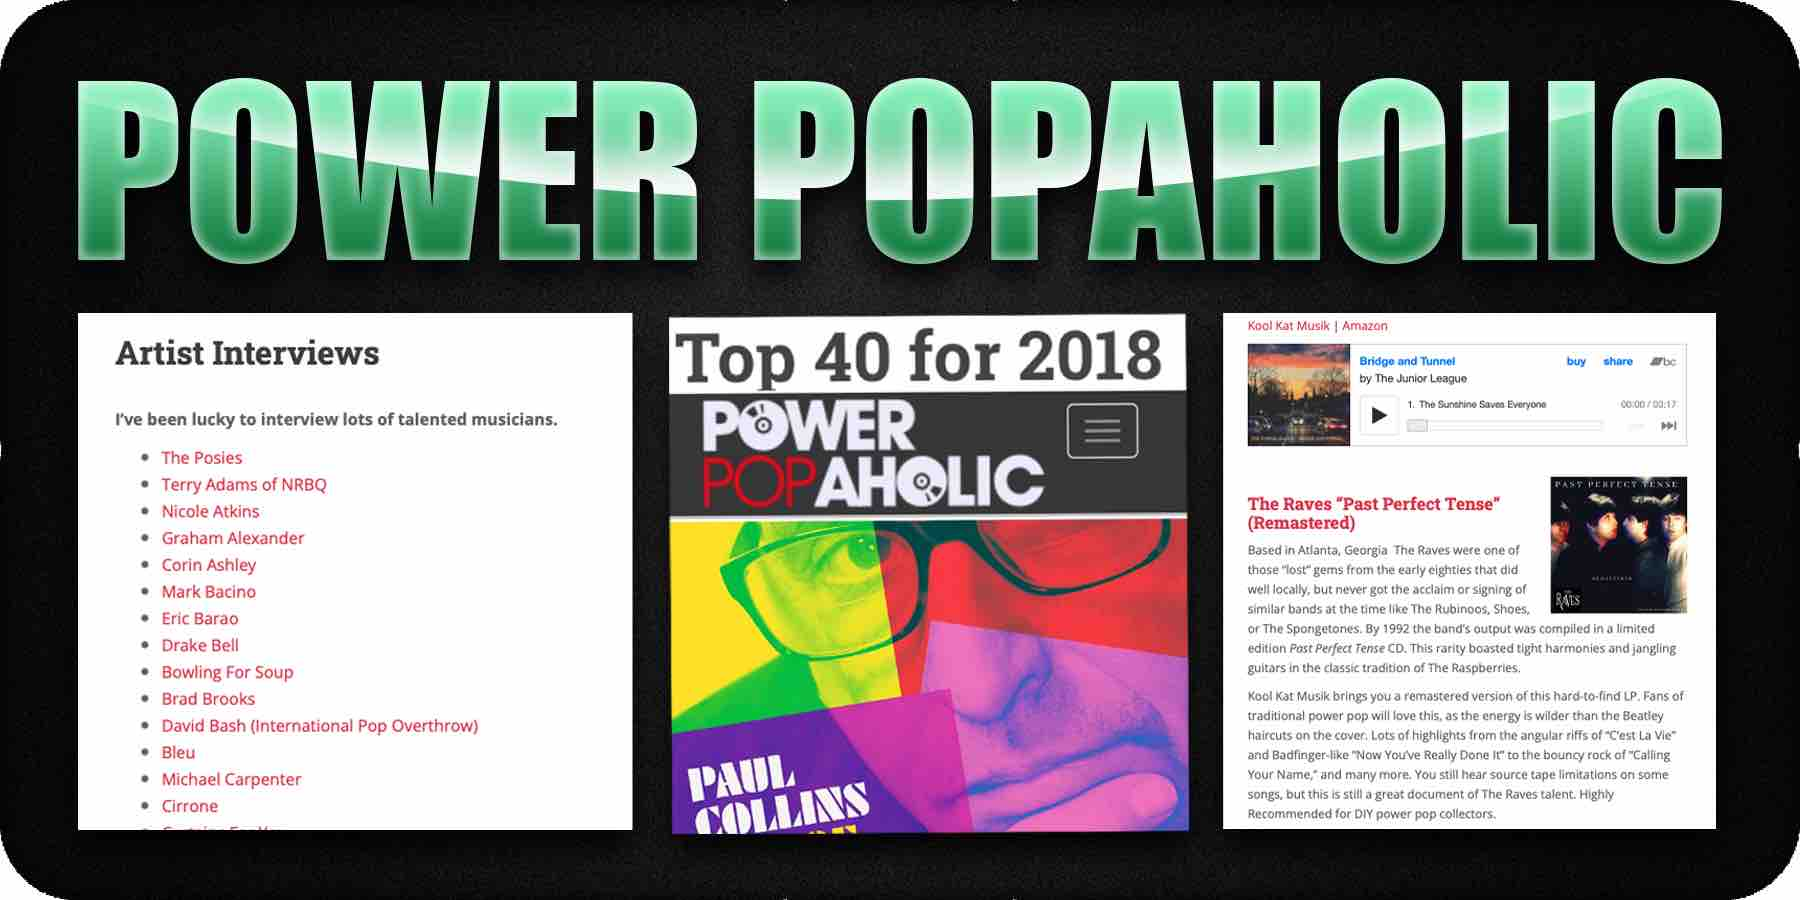 Power Popaholic (Music Blog)